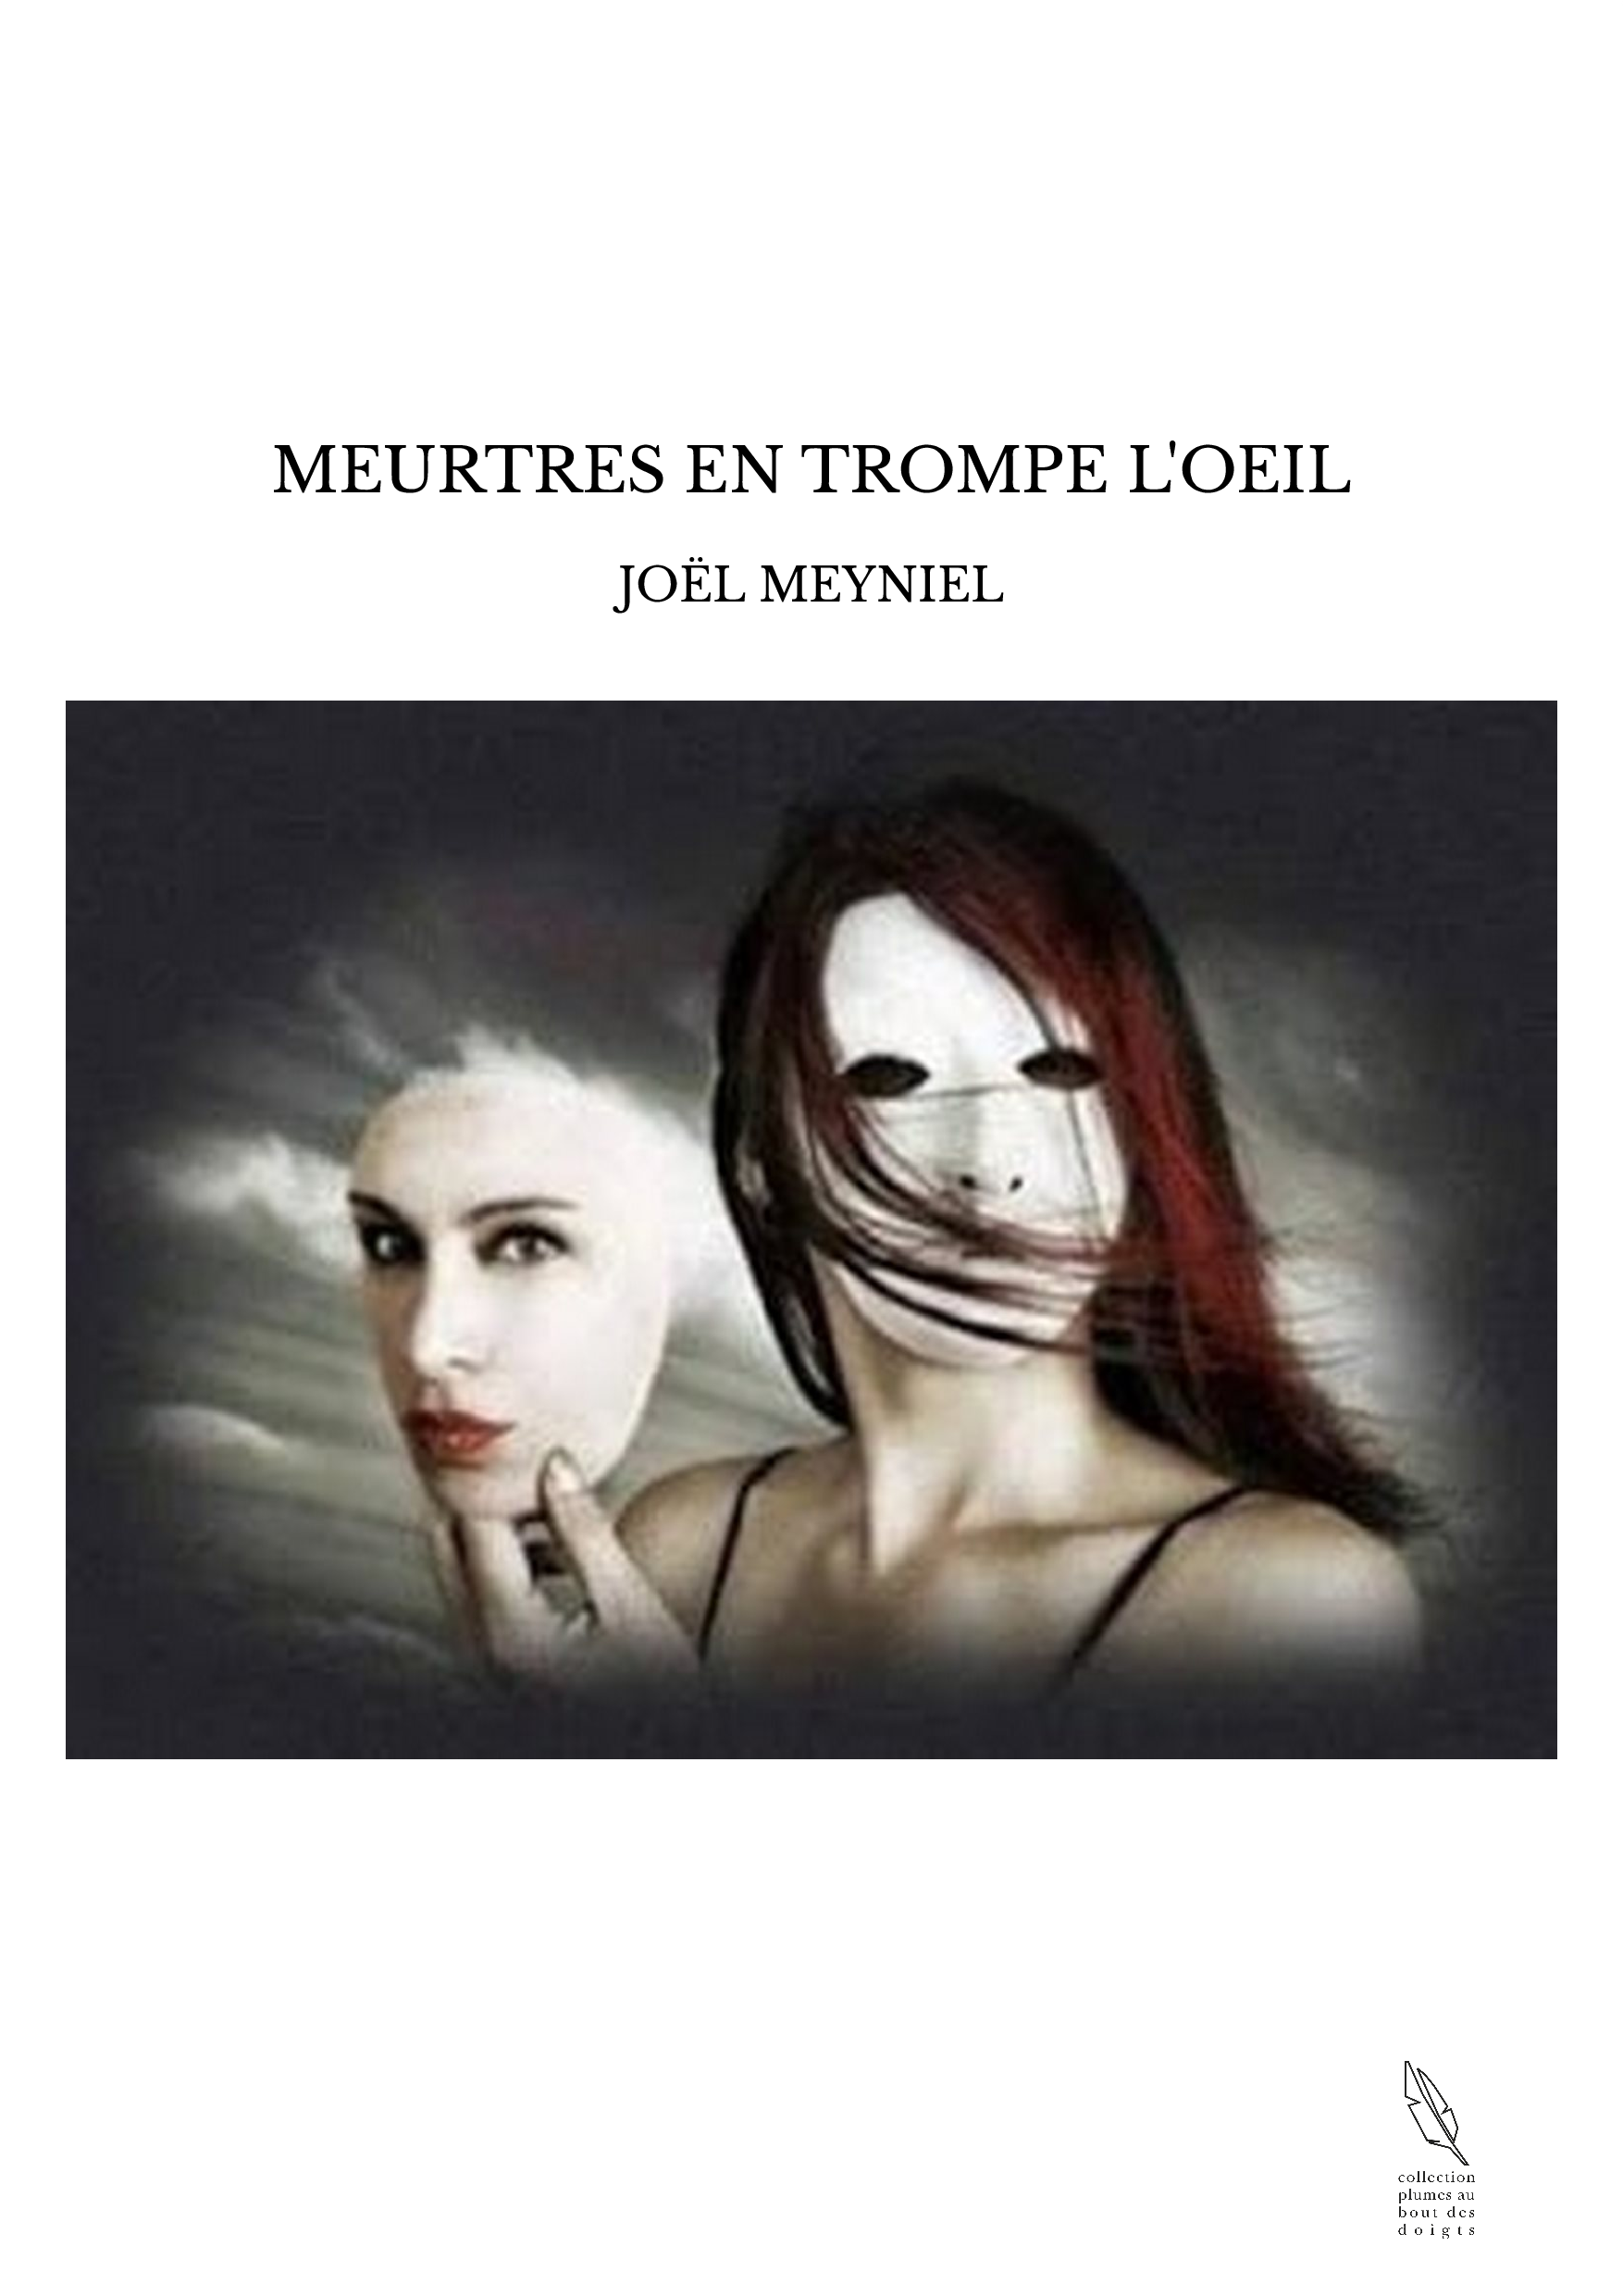 MEURTRES EN TROMPE L'OEIL